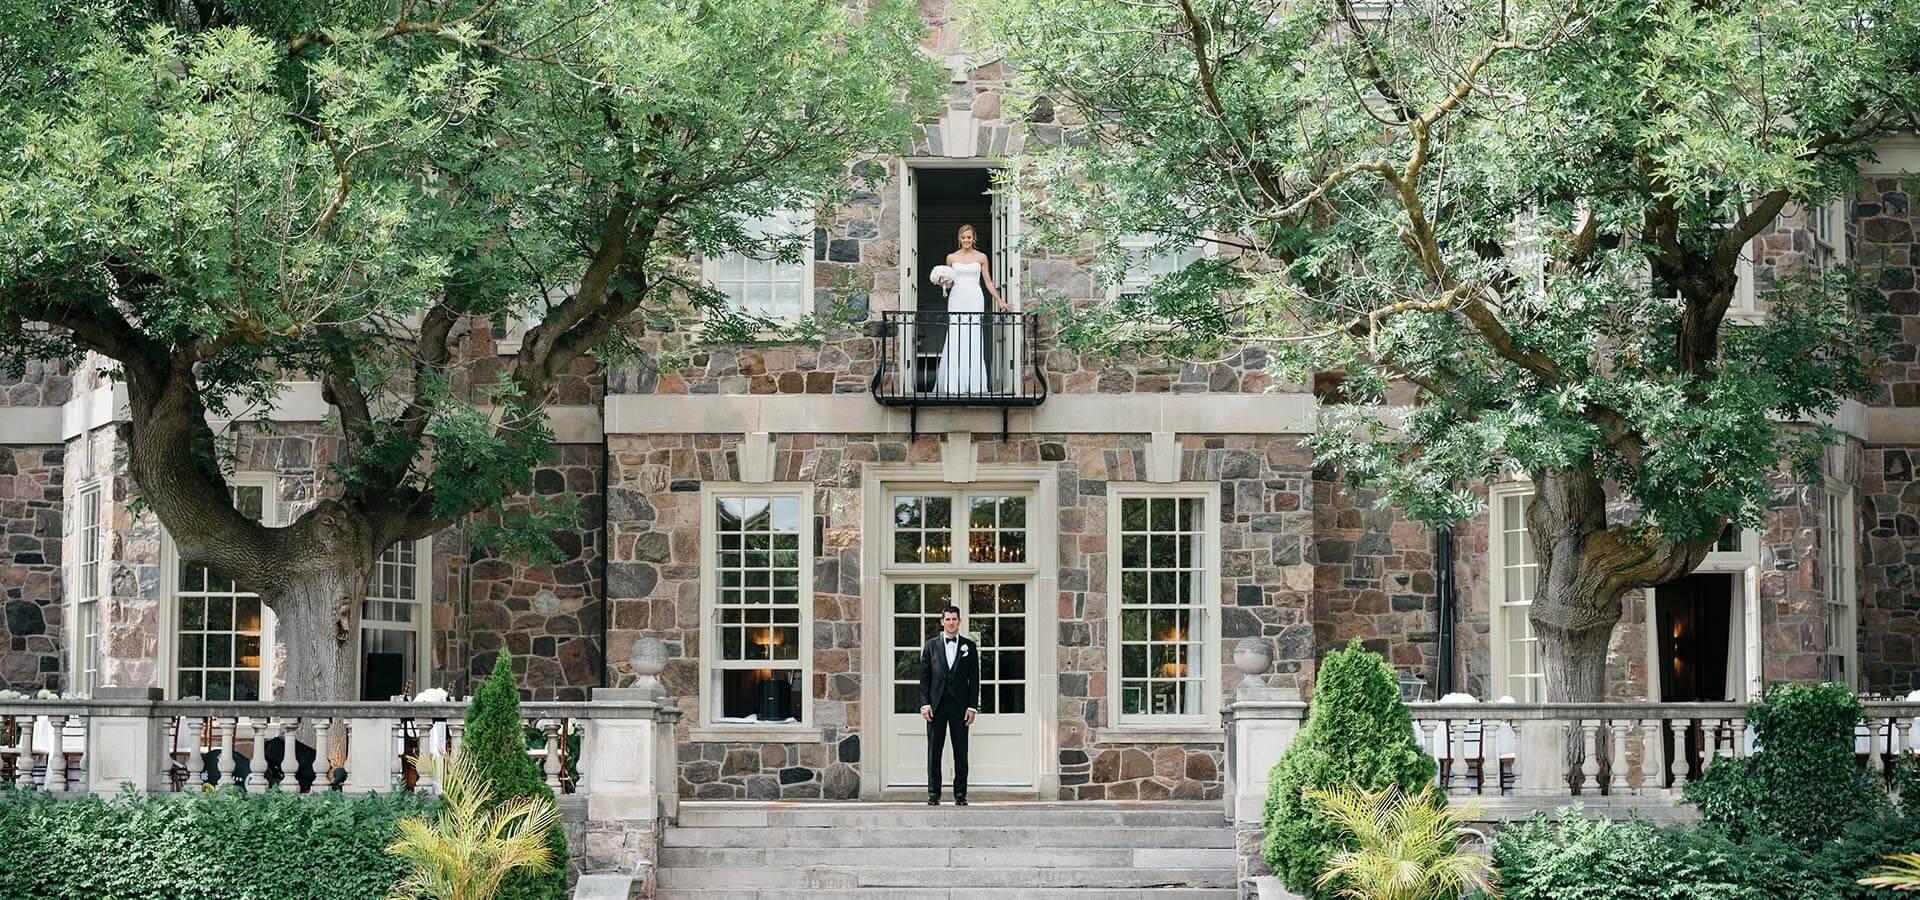 Hero image for Amanda and James' Elegant Wedding at Graydon Hall Manor